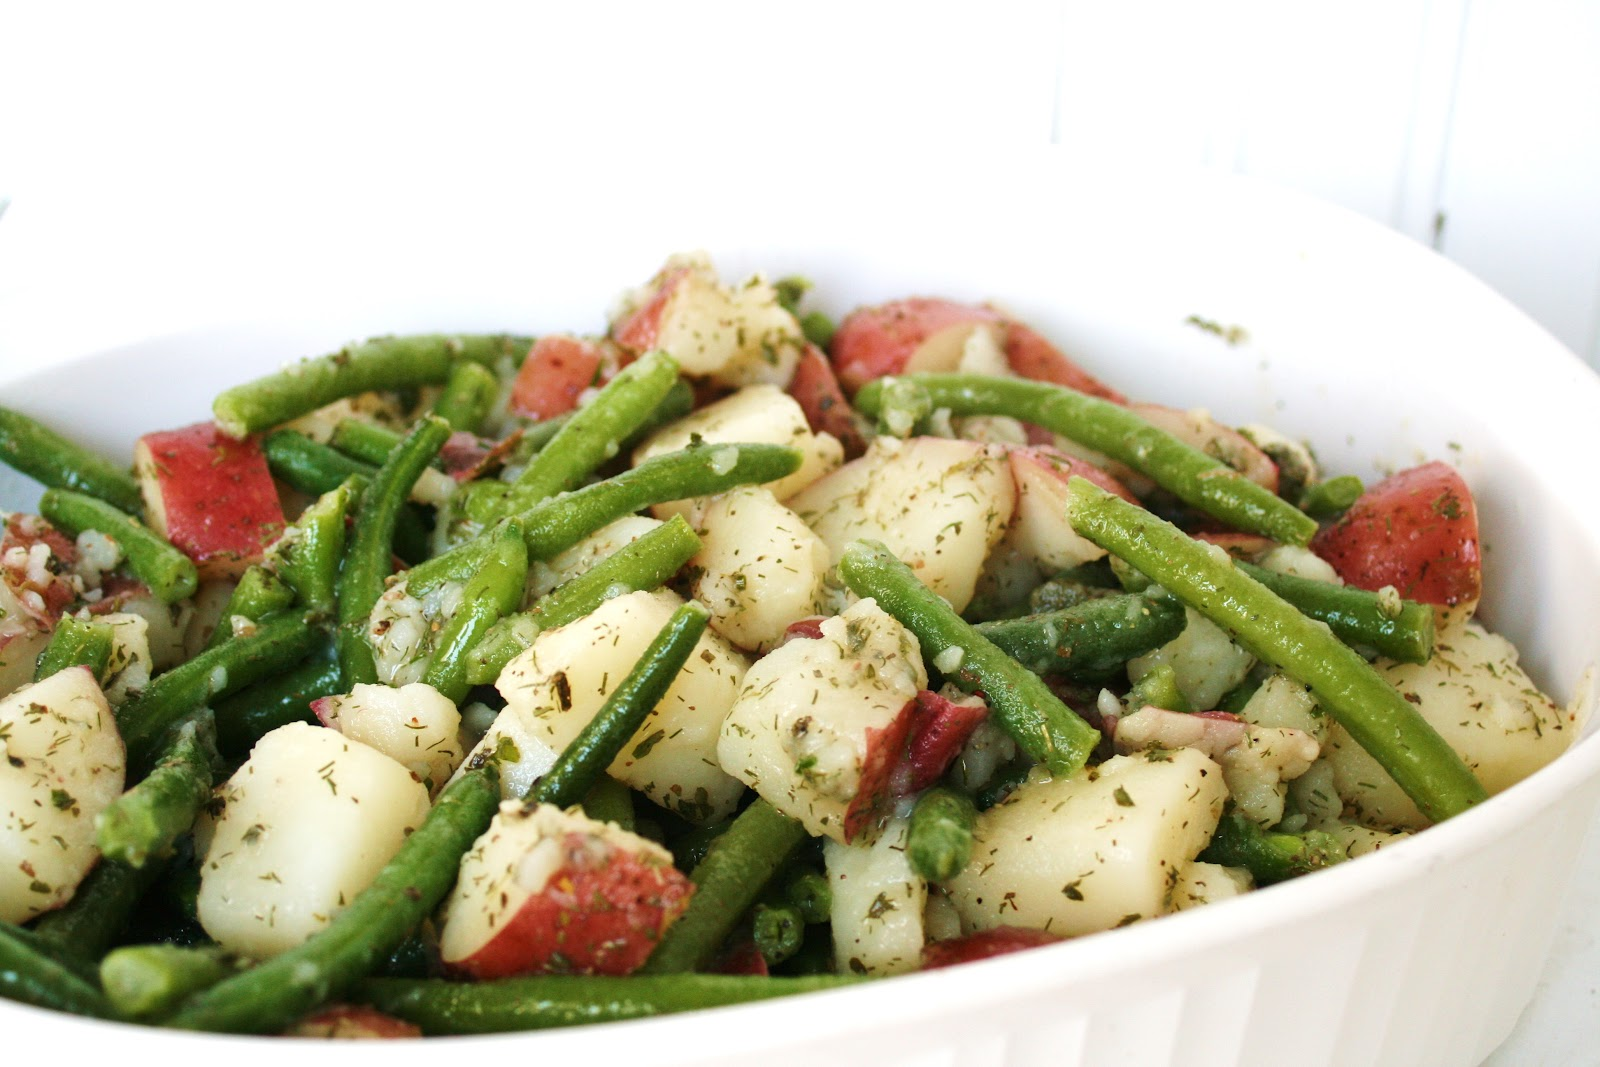 Communication on this topic: French Potato Salad, french-potato-salad/